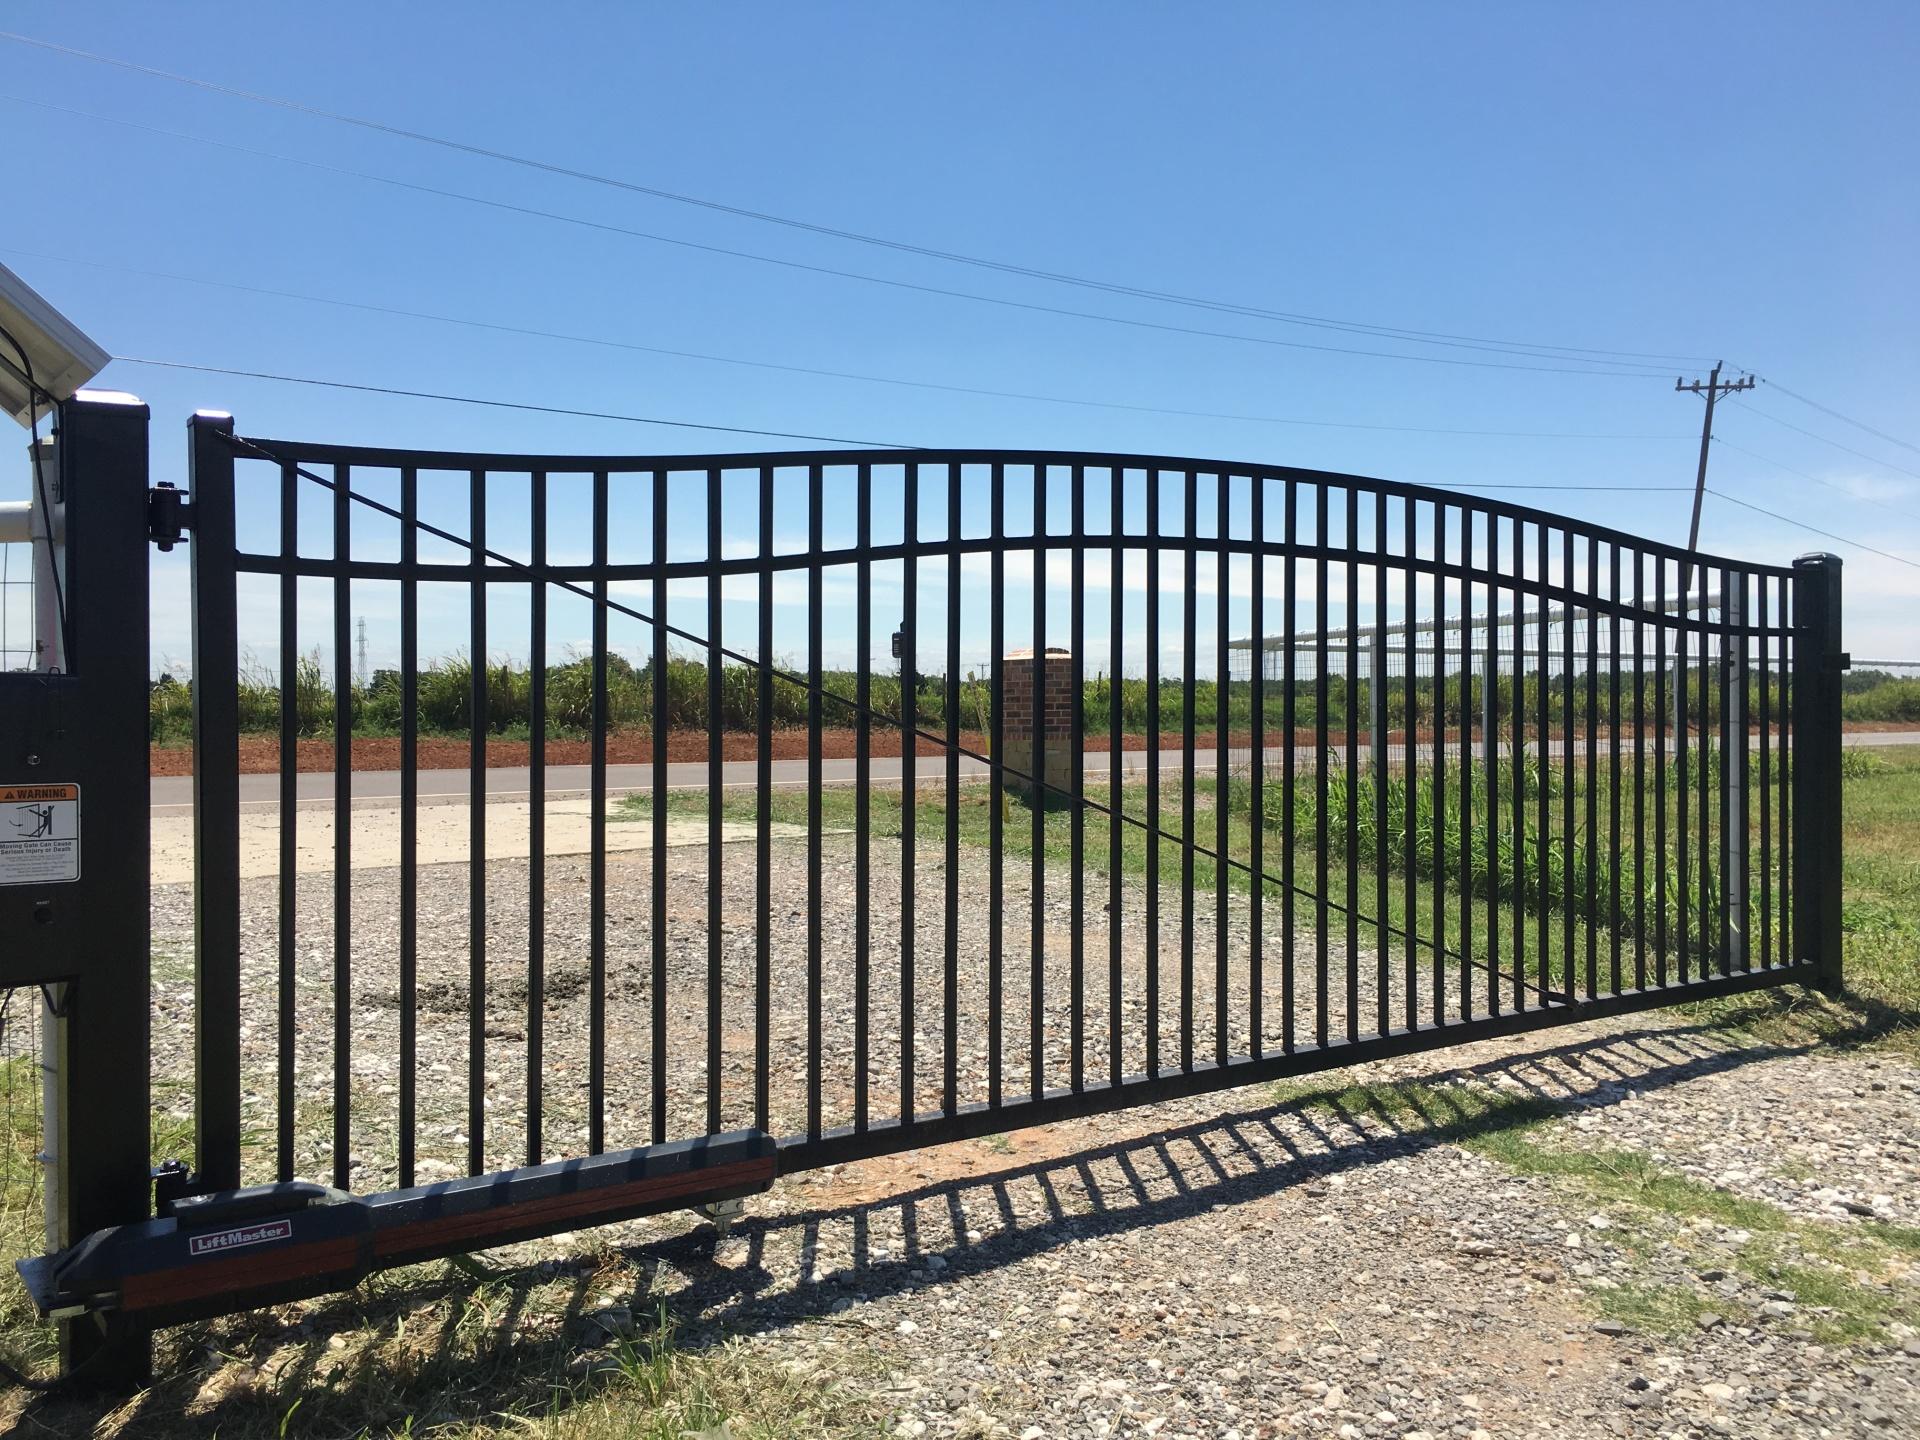 Economical Gate - Edmond fence and gate company - solar openers - gate access - security gates - custom iron gates - driveway gate opener - local oklahoma company